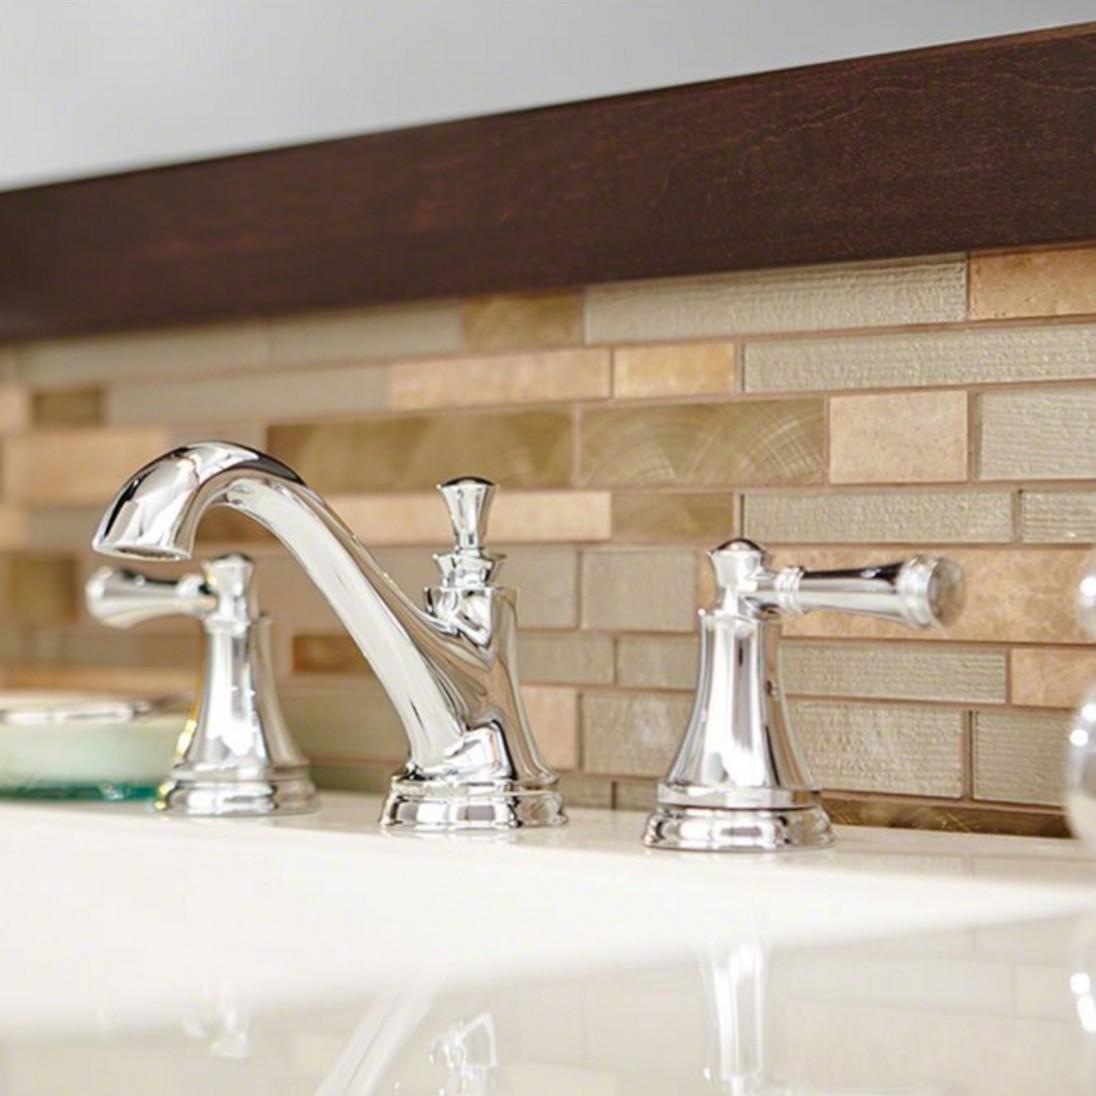 backsplash-bathrooms